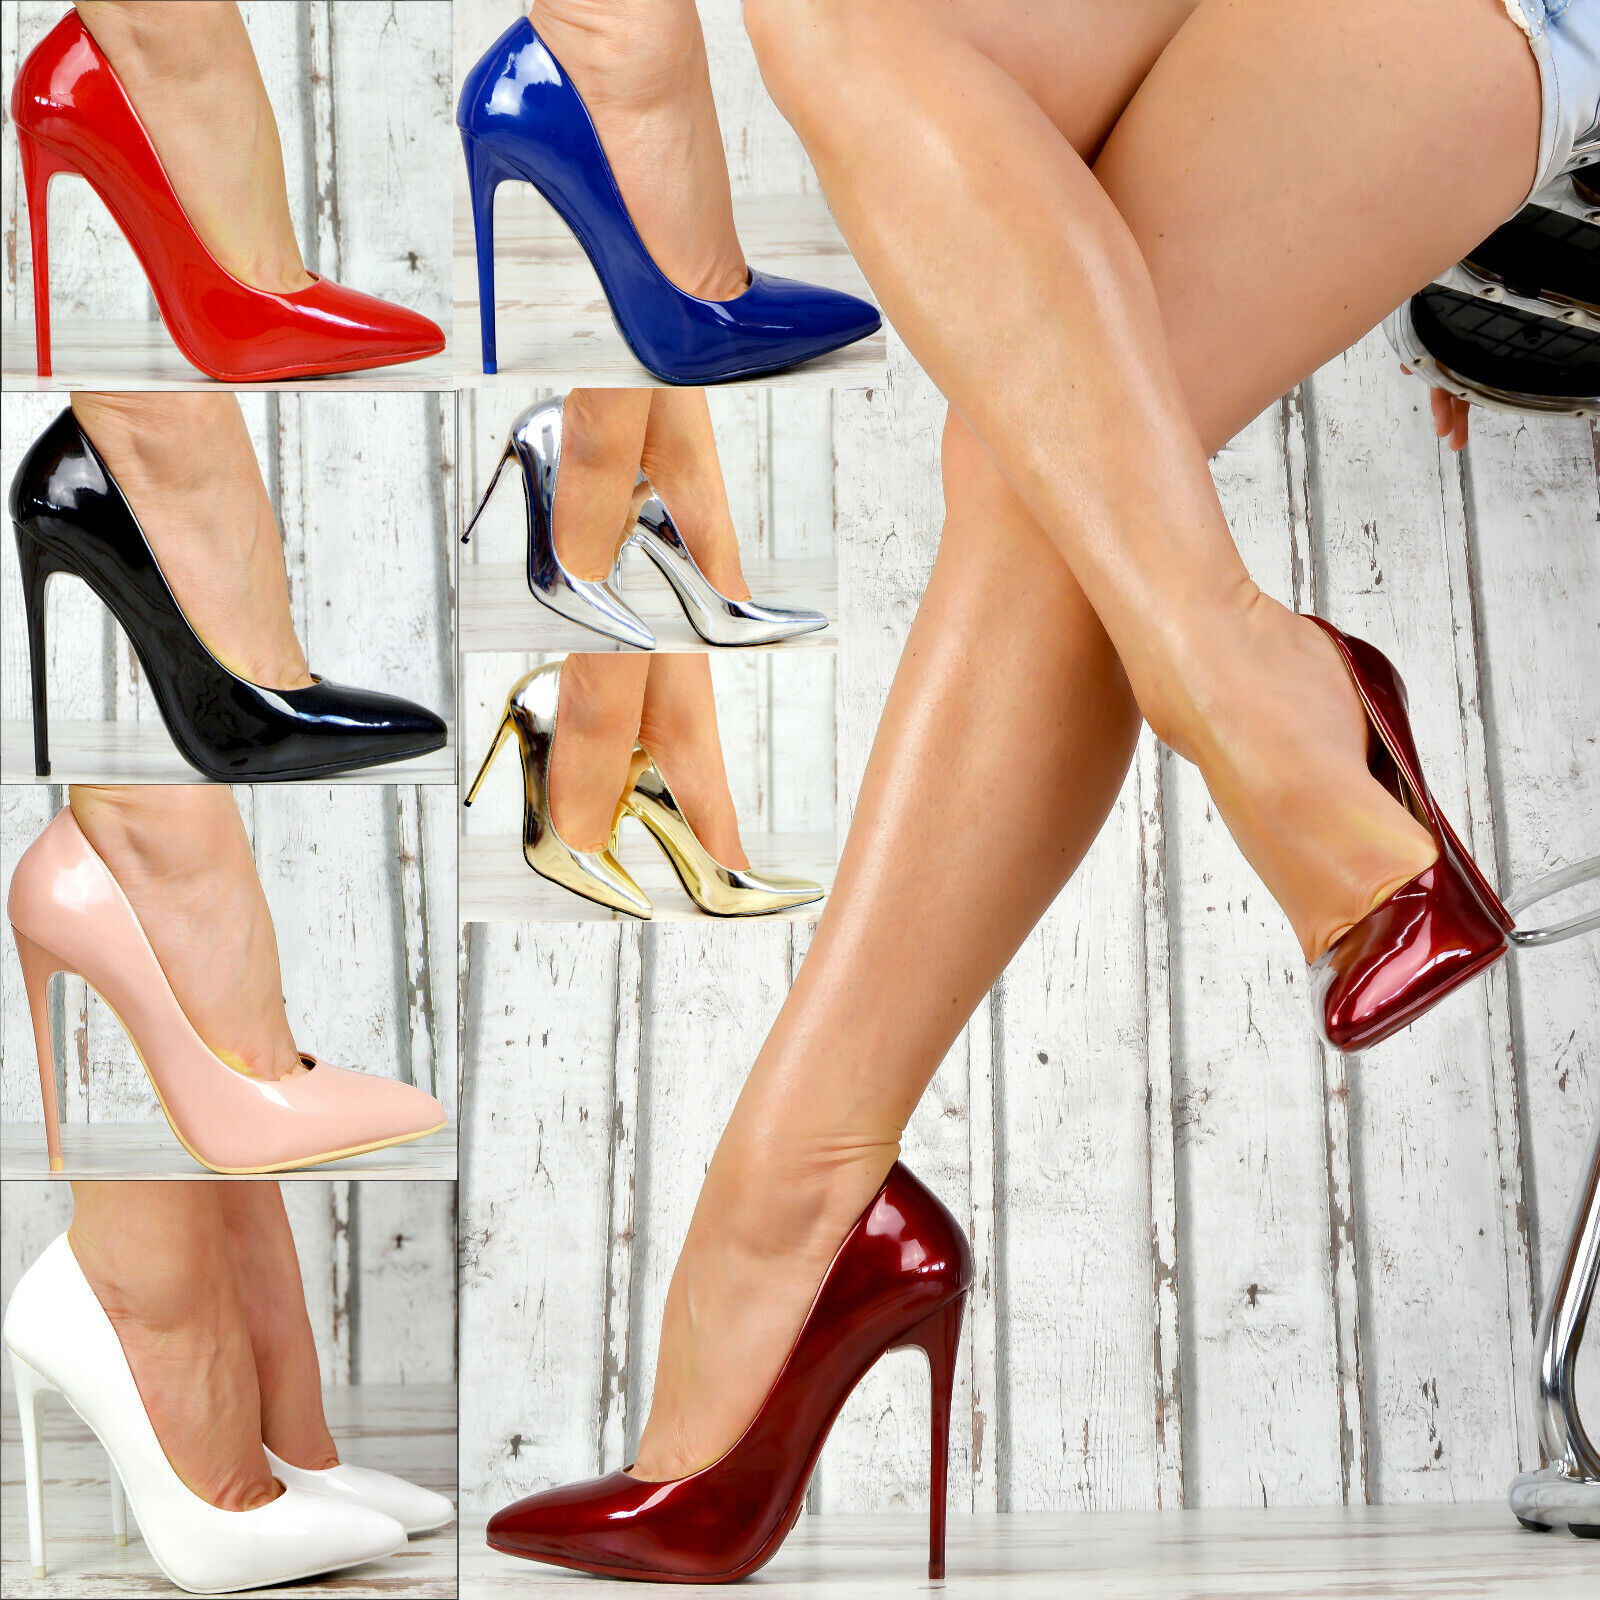 Neu Spitze Damenschuhe Party Glanz Lack Pumps Damen High Heels XXL Stiletto